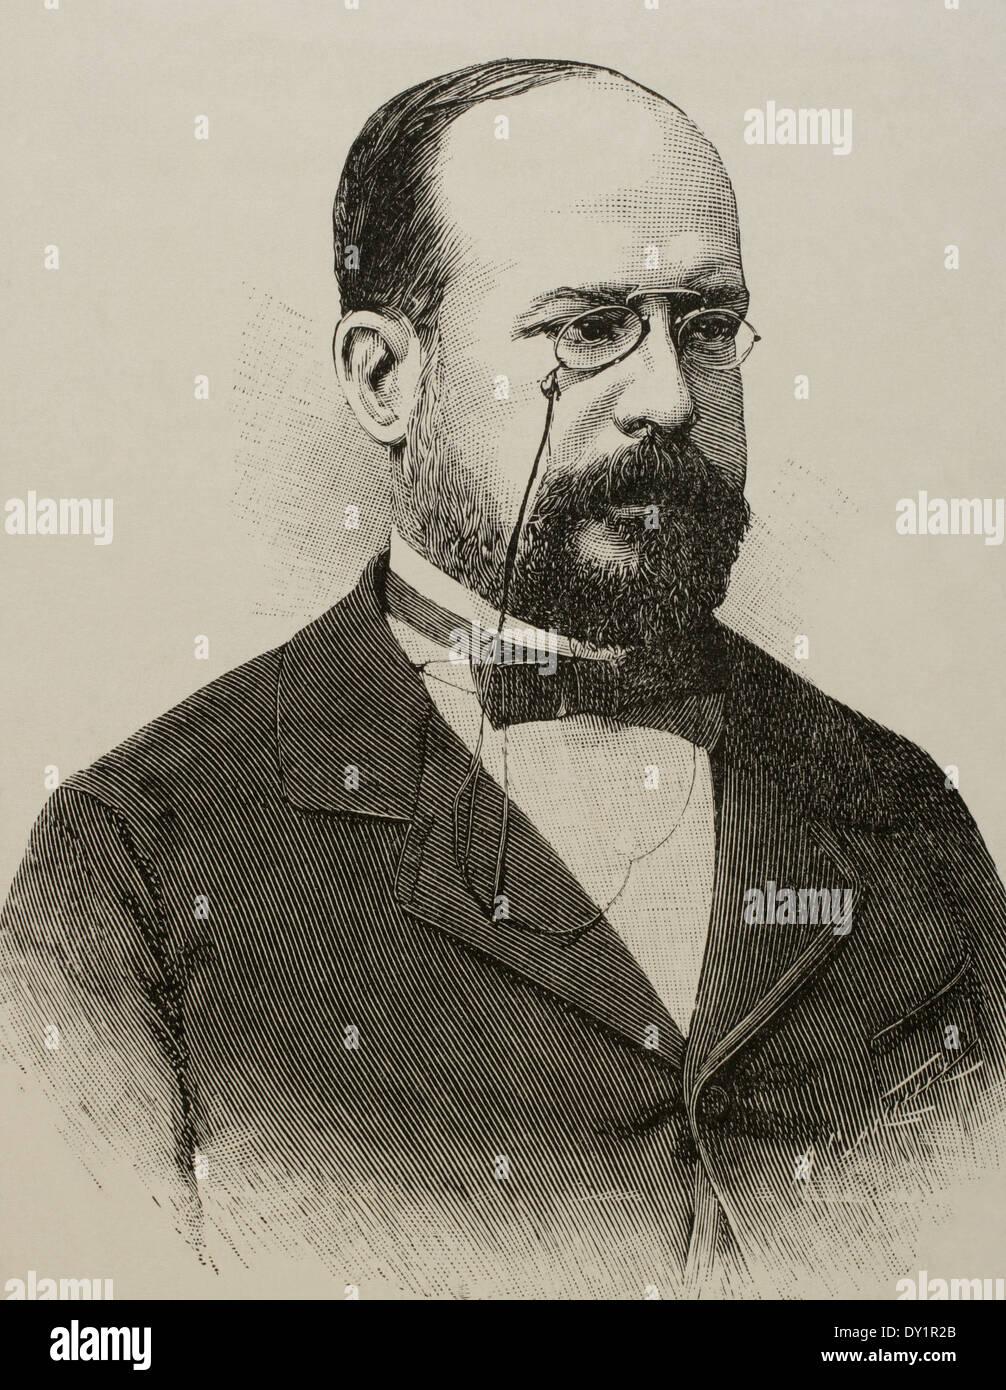 Eduardo Leon y Ortiz (19. Jahrhundert). Spanisch-Professorin an der Fakultät der Universidad Central. Stockbild